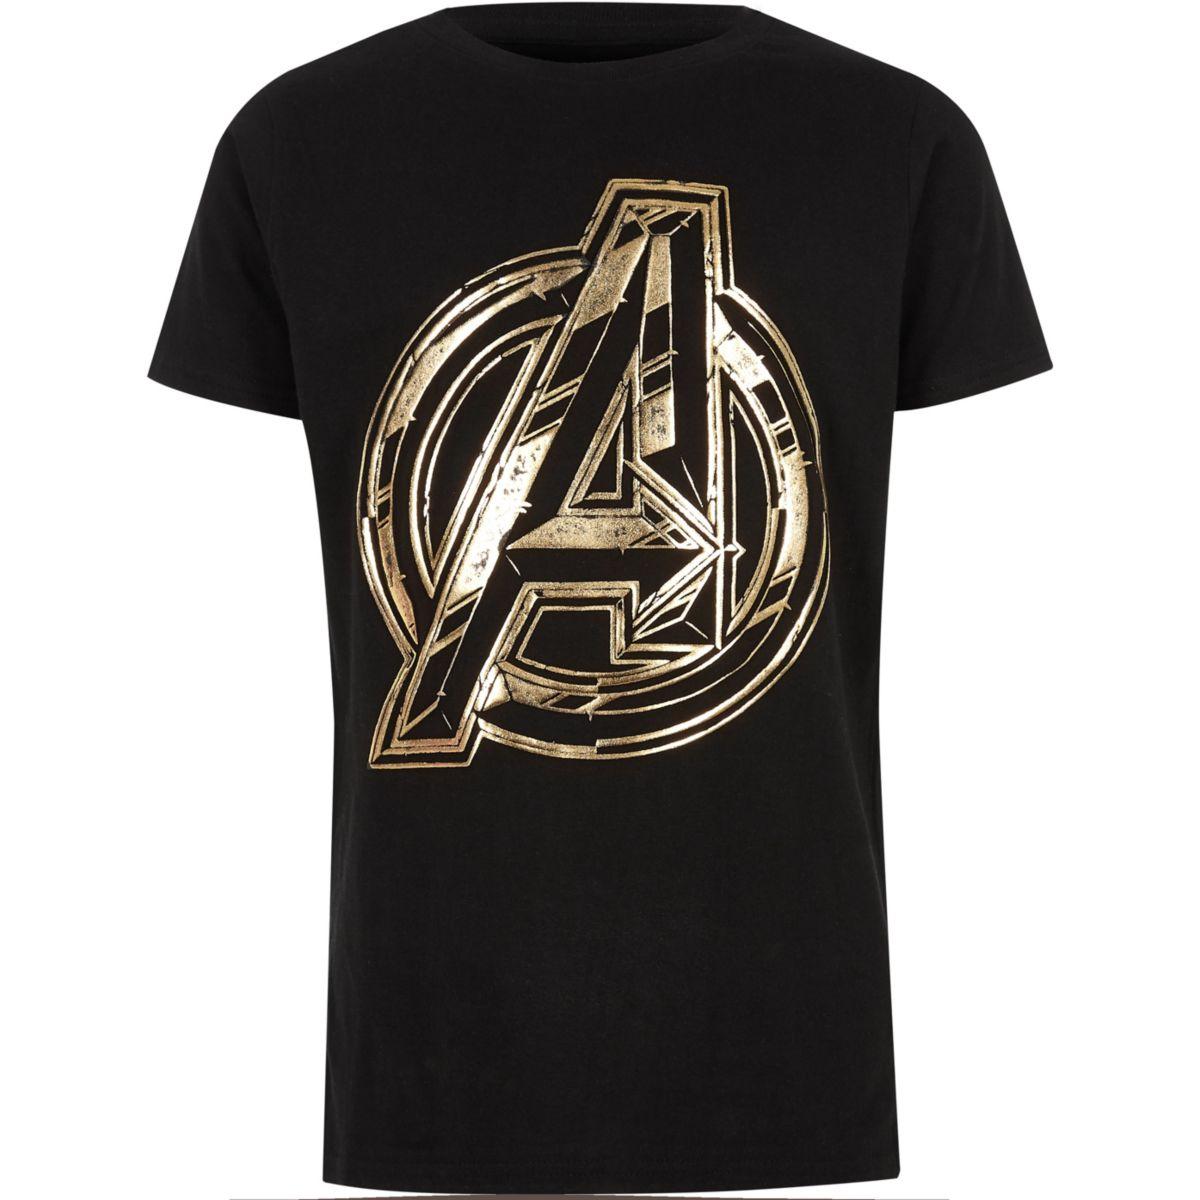 Boys black Avengers foil T-shirt